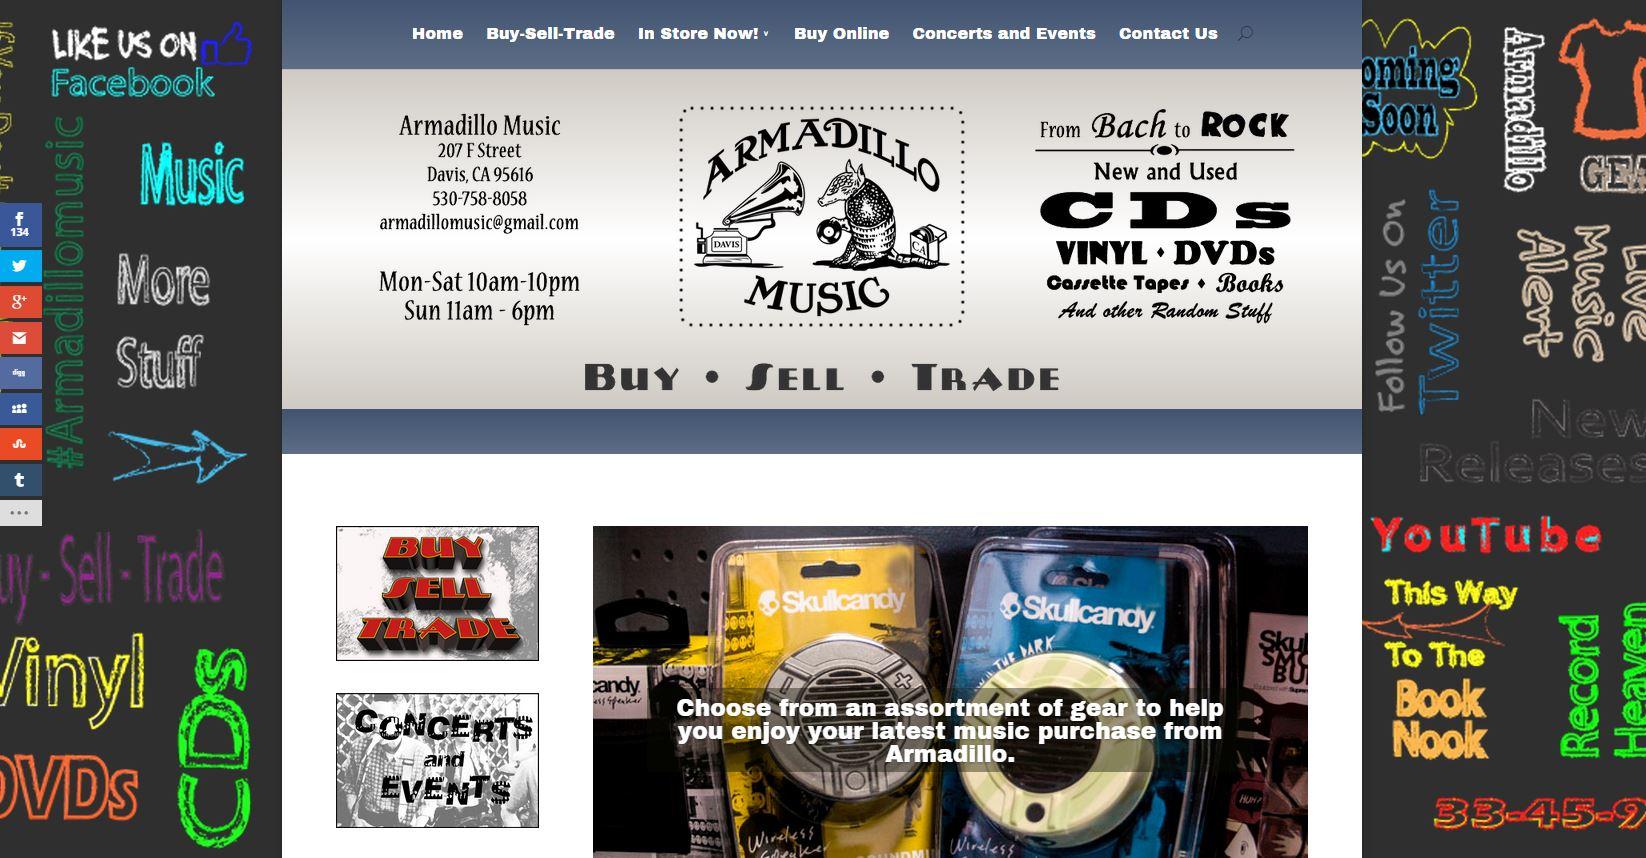 Armadillo Music - Abaton Consulting